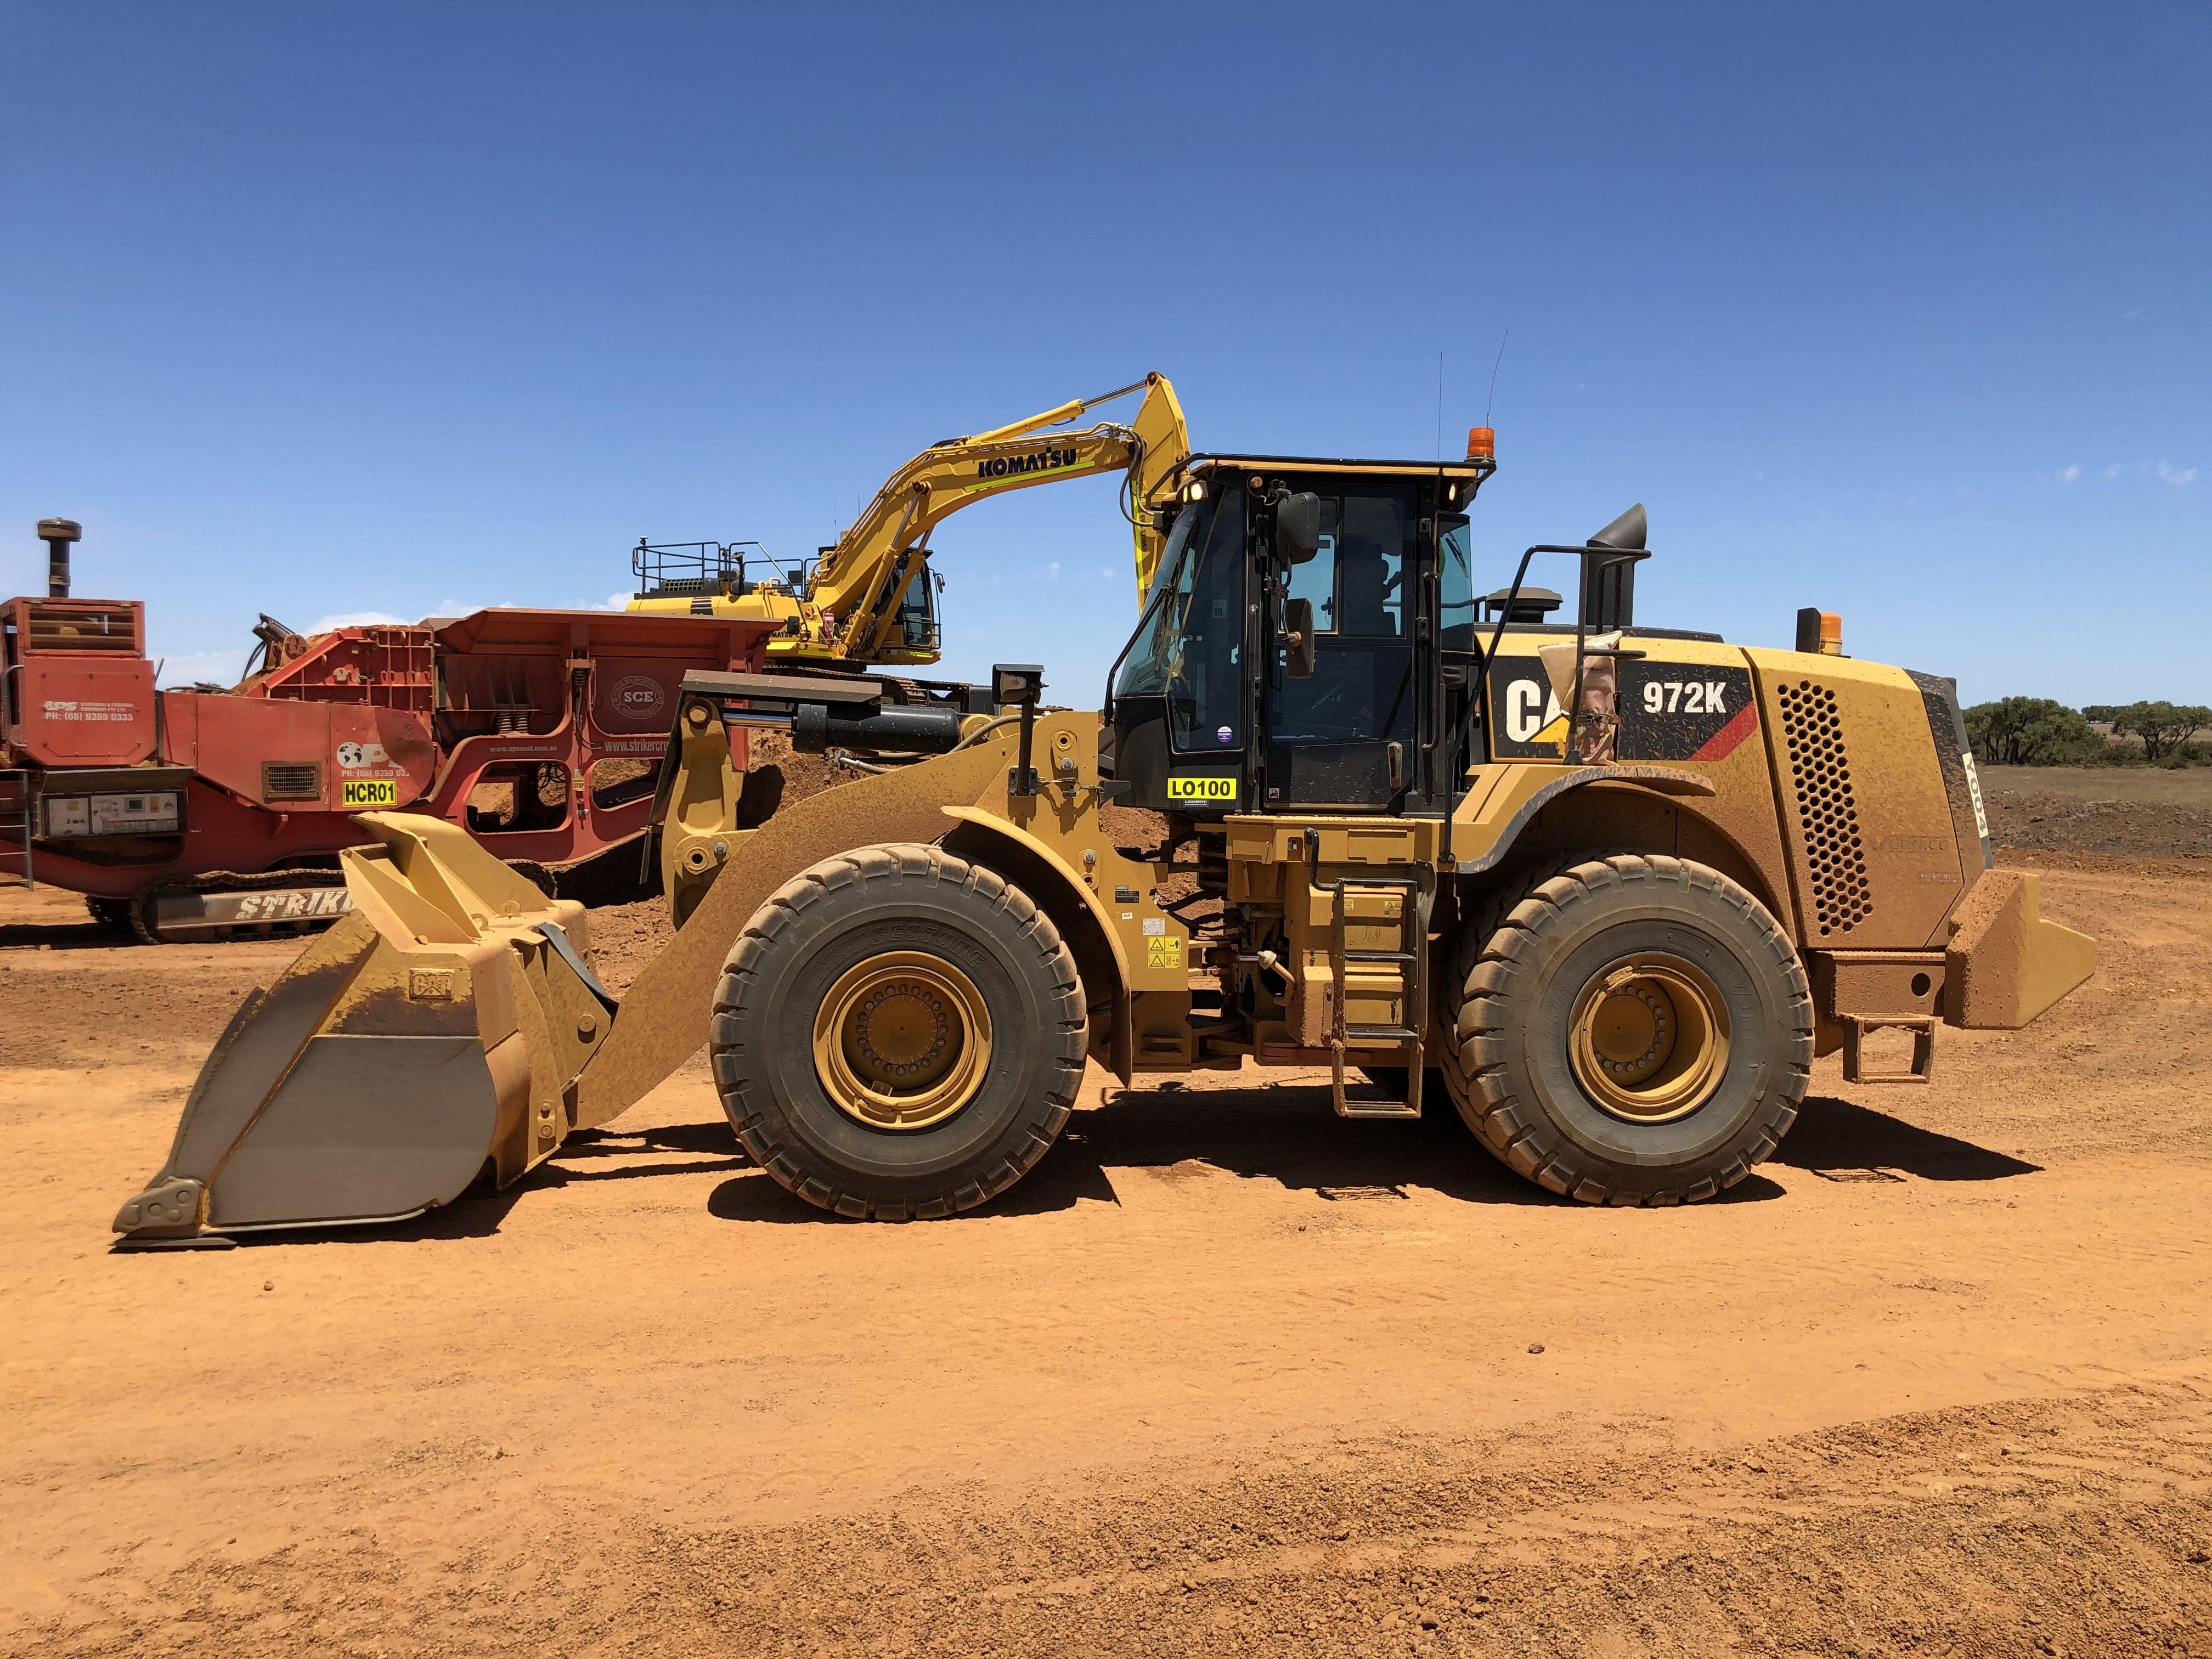 45t loader hire vernice western australia